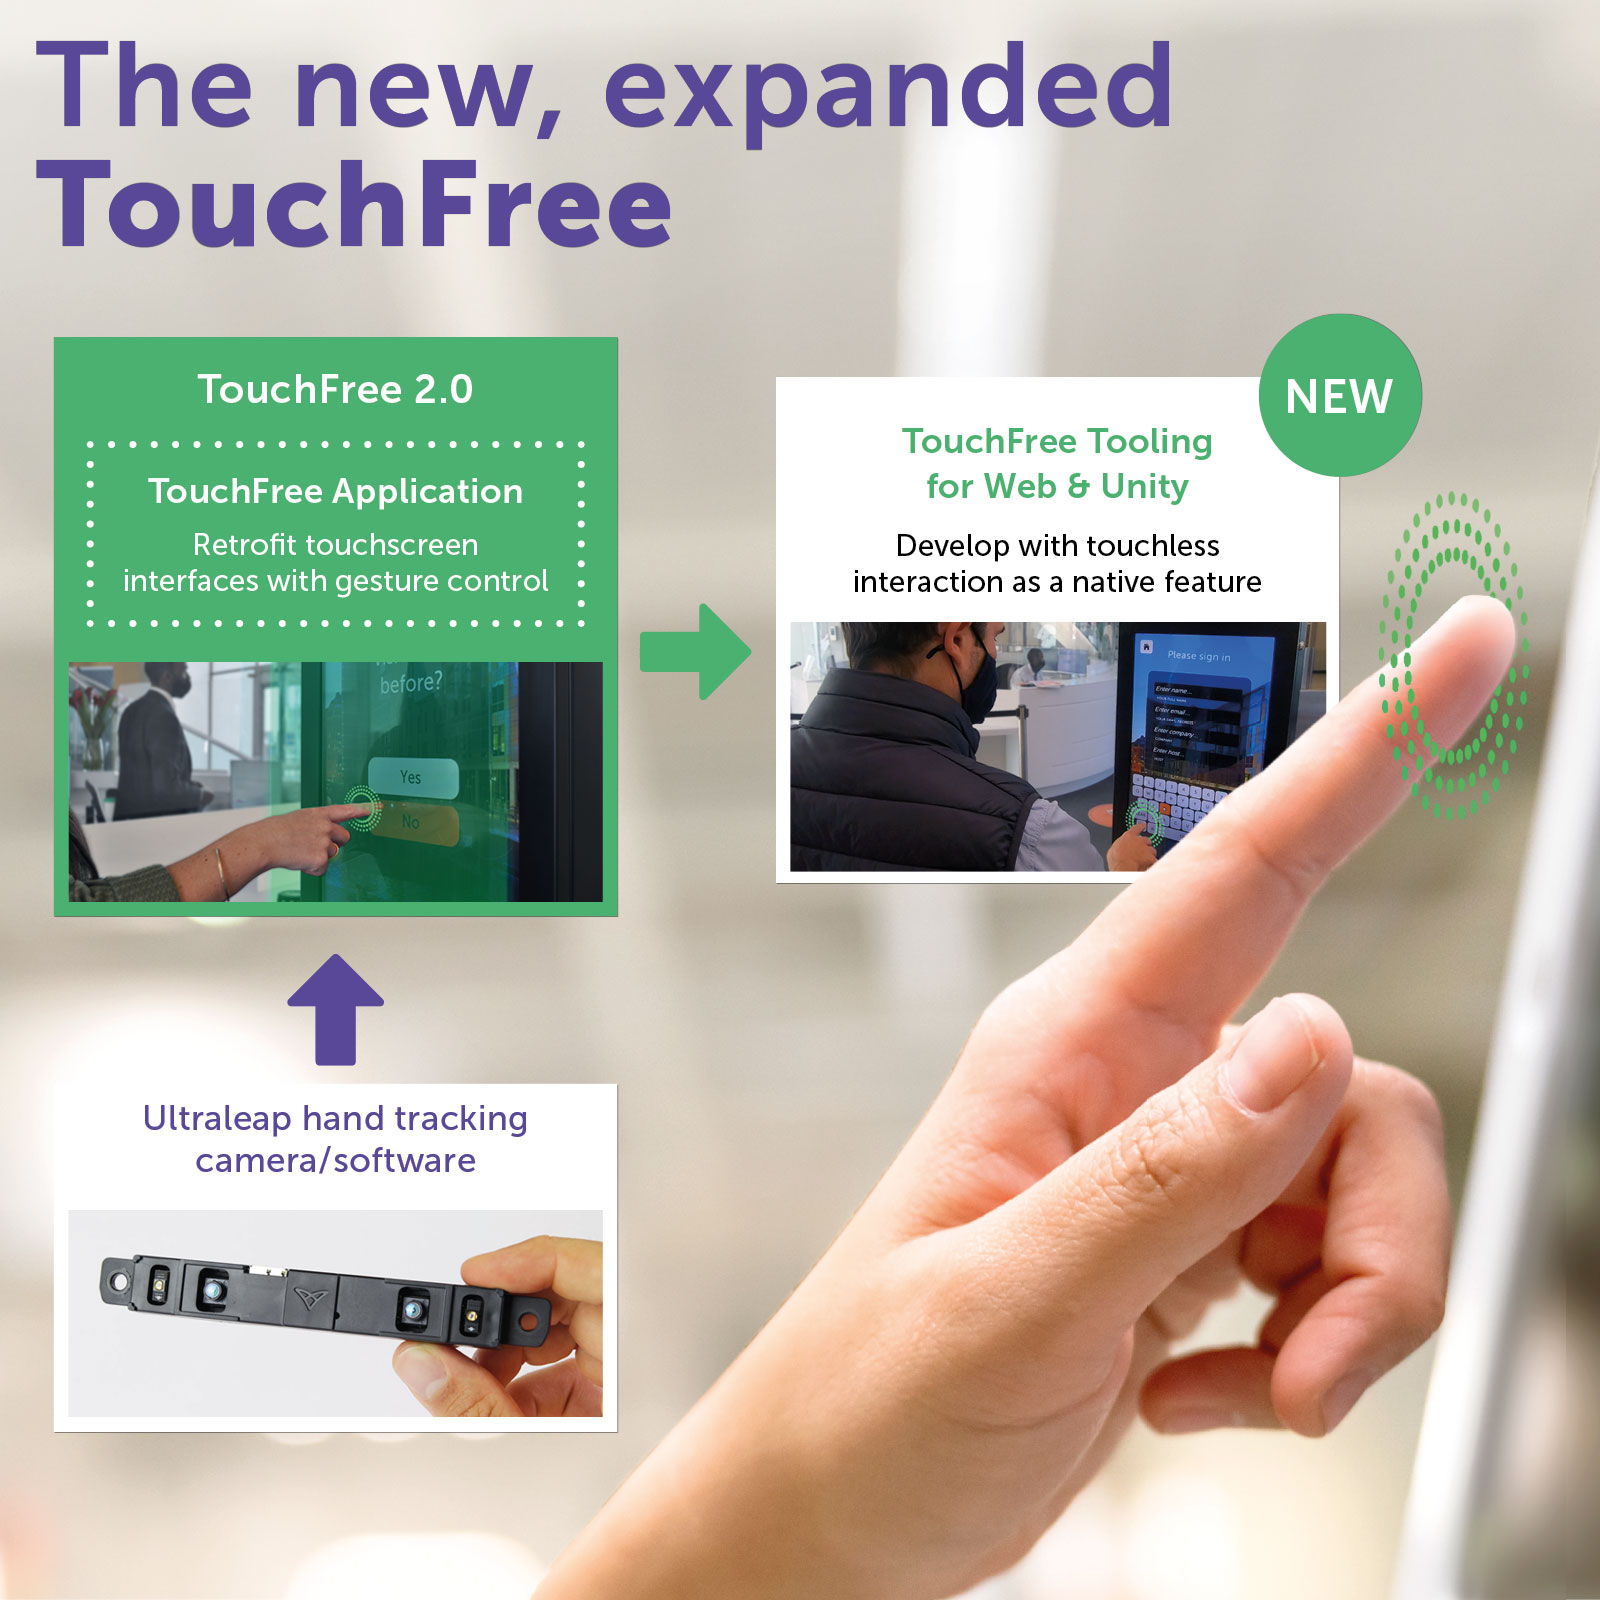 TouchFree infographic